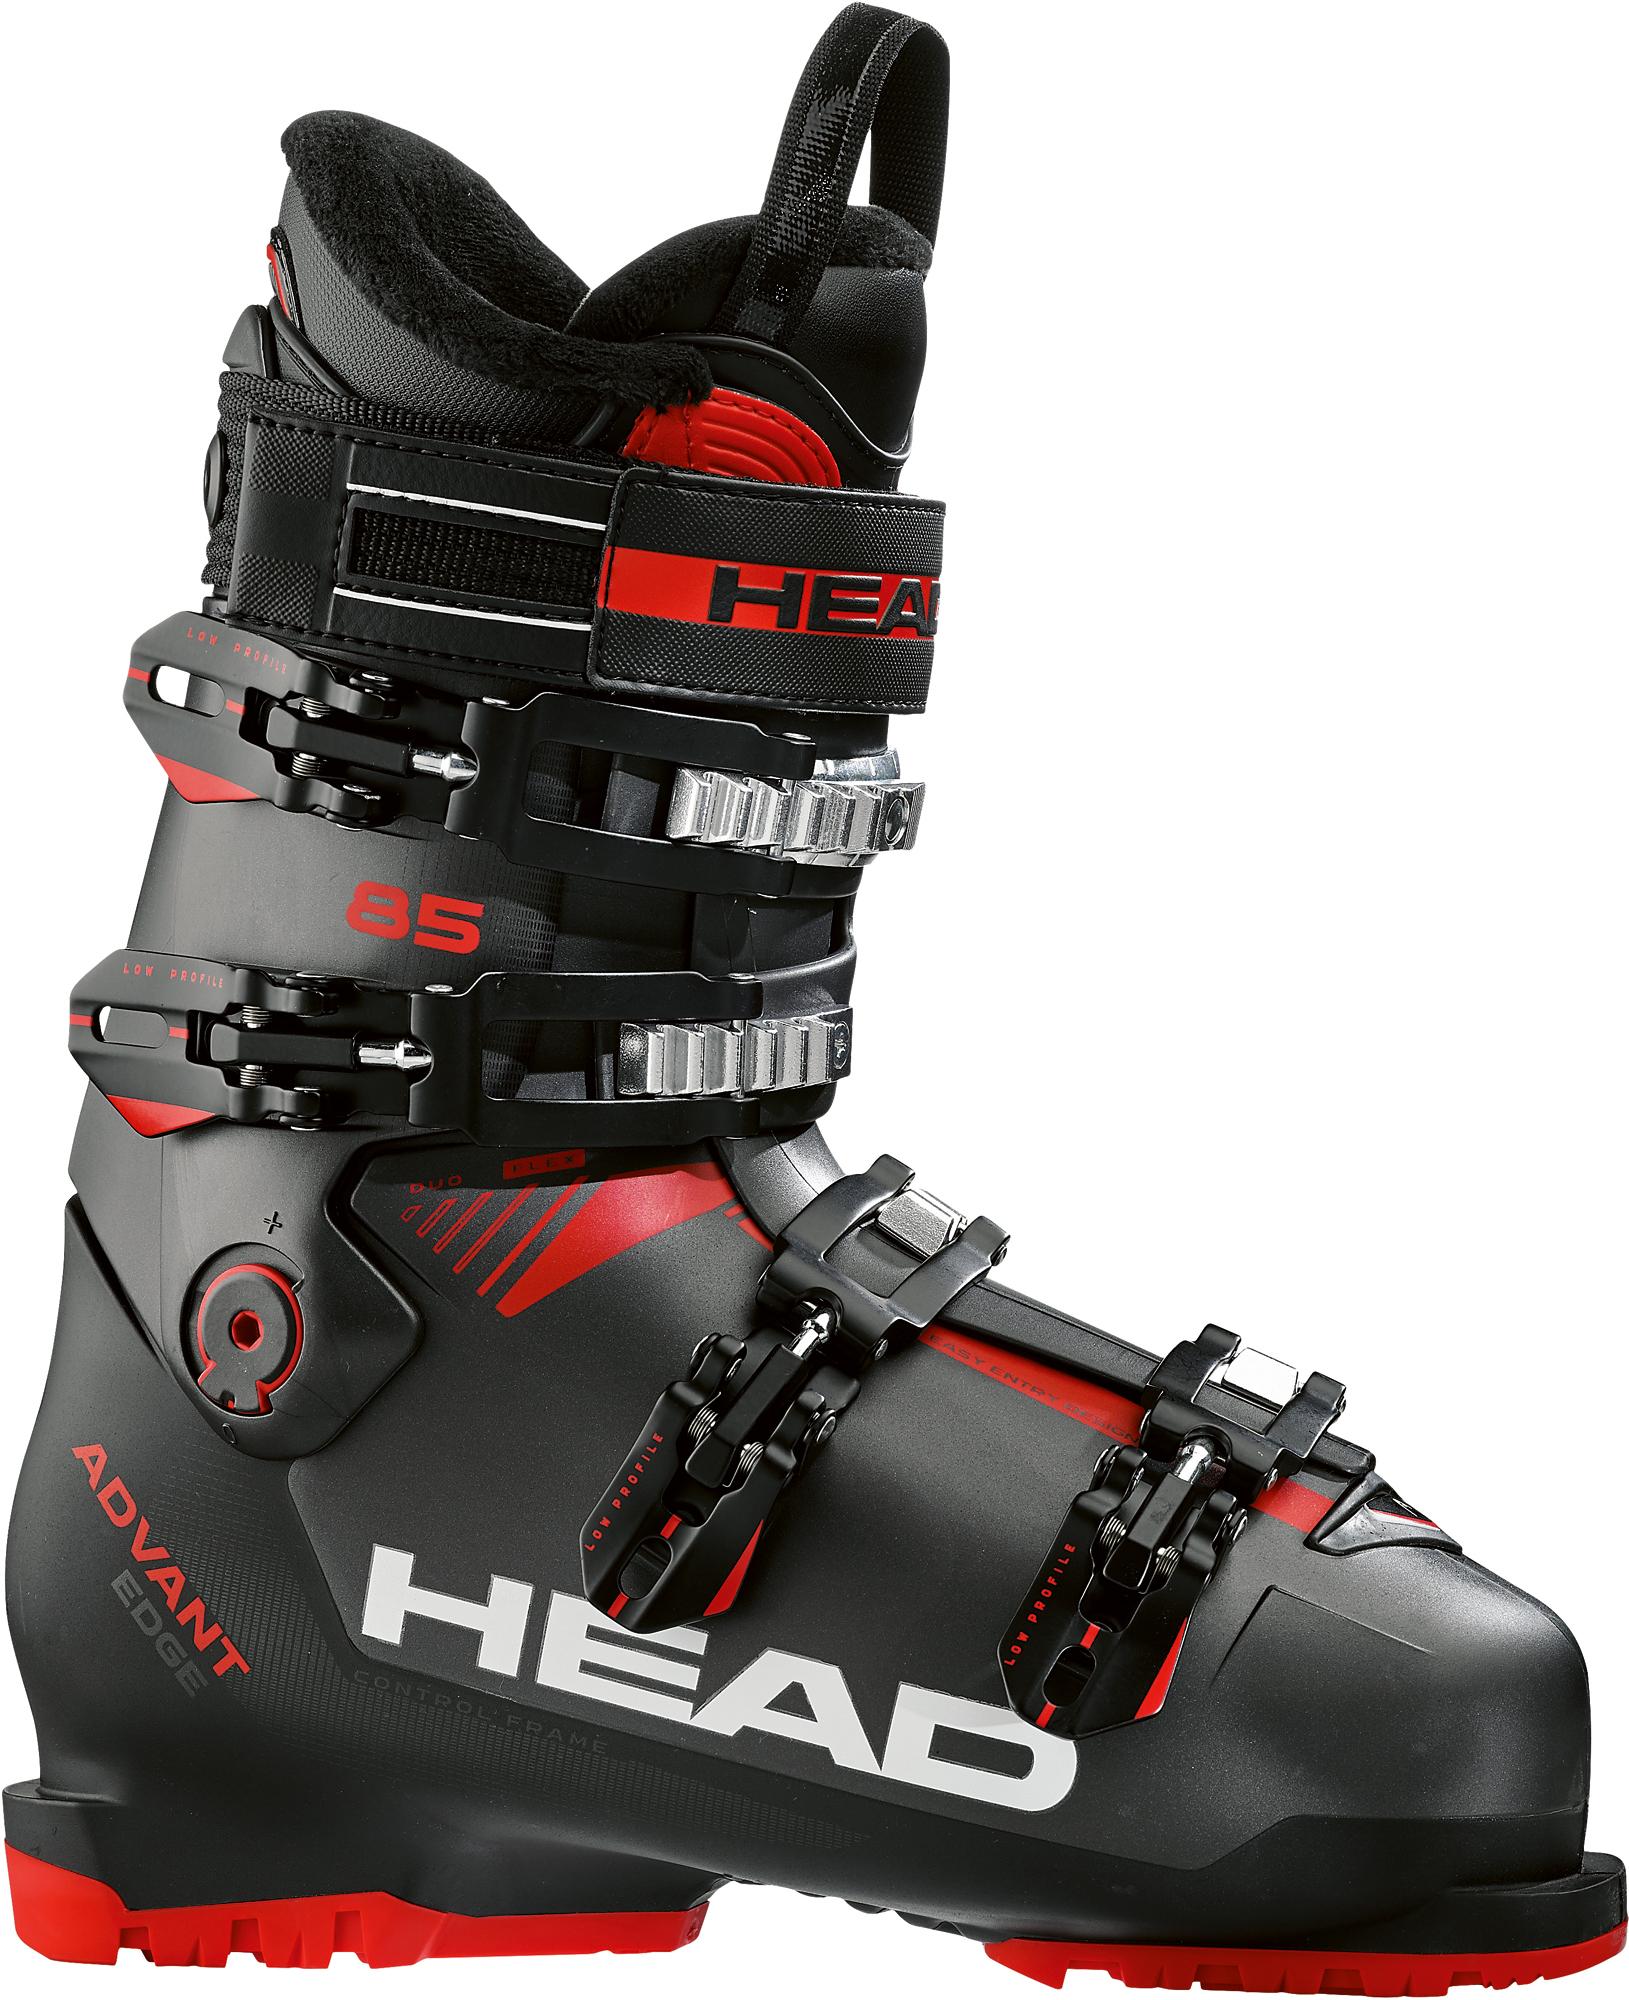 Head Ботинки горнолыжные ADVANT EDGE 85, размер 28,5 см